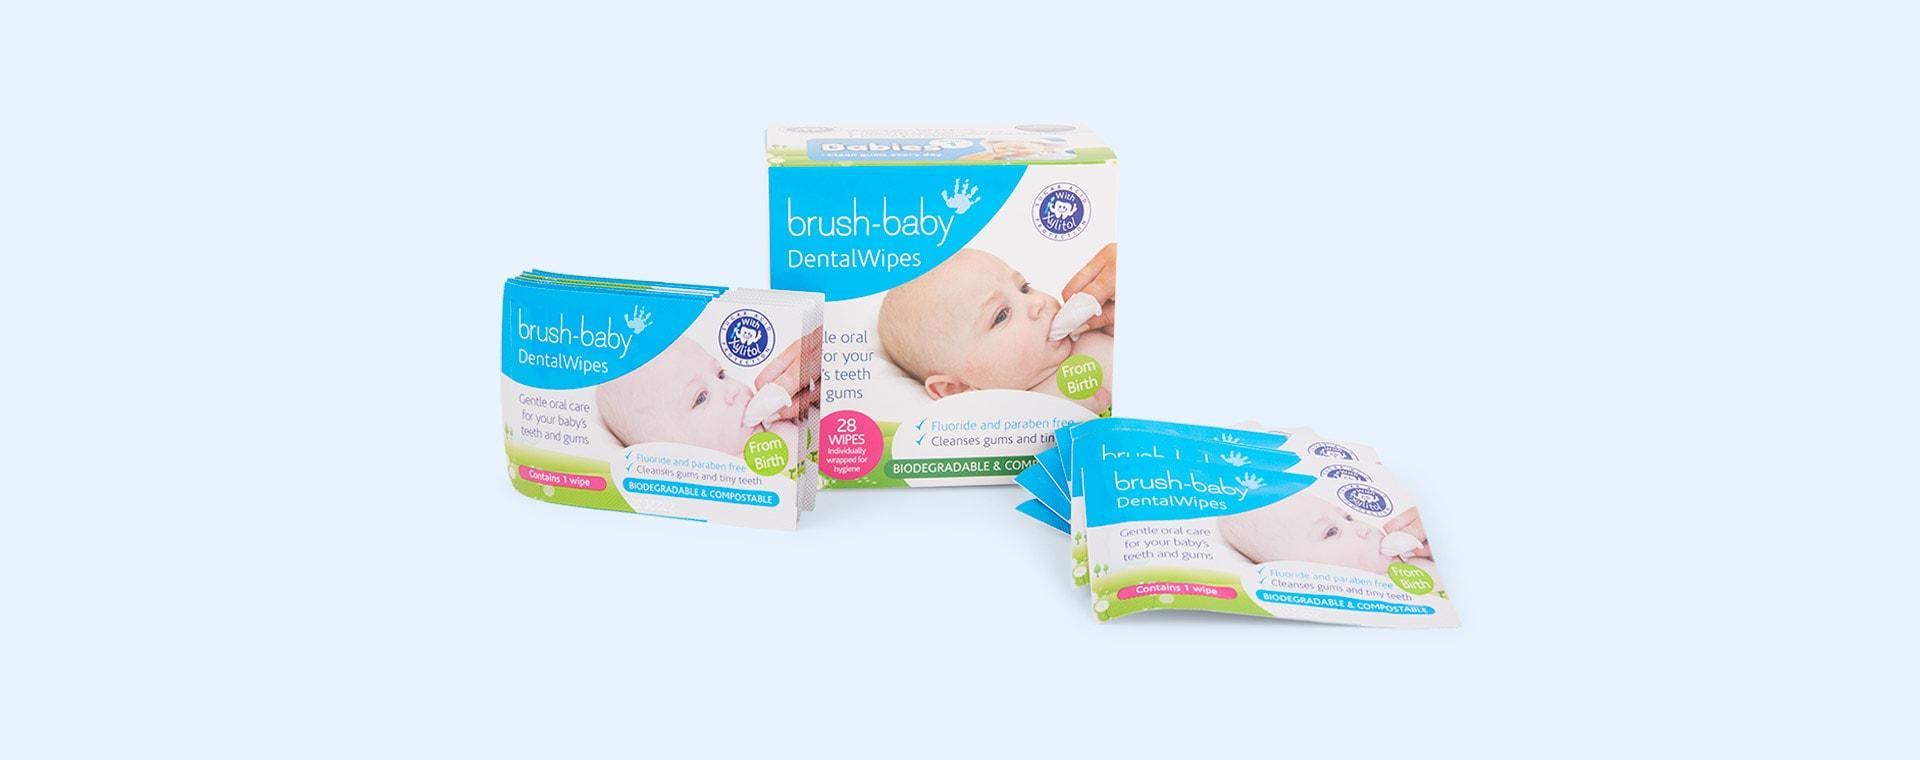 White Brush-Baby Dental wipes